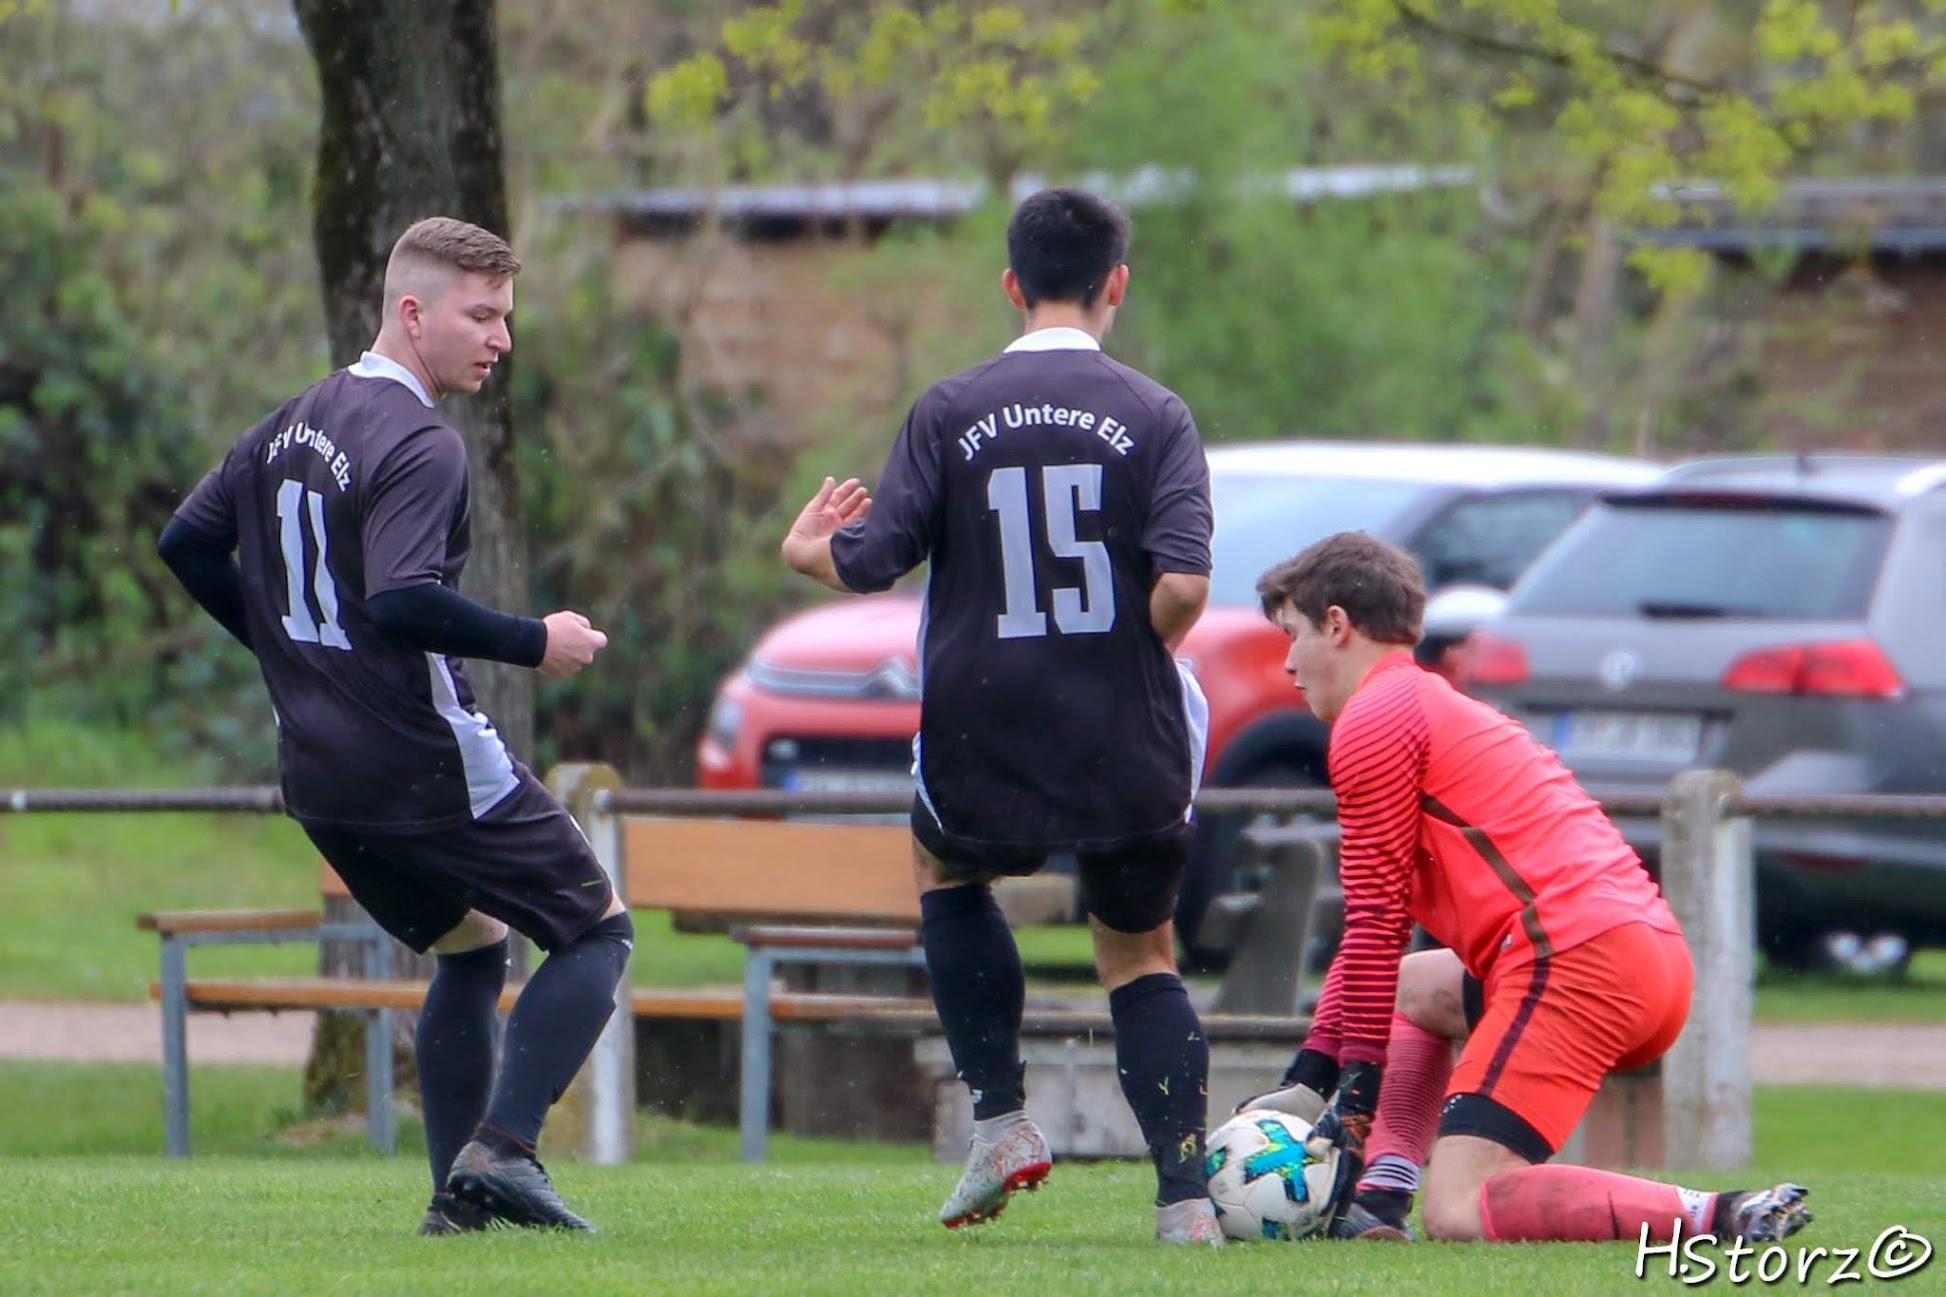 A-JFV Untere Elz – FC Denzlingen  3:1  (0:1)